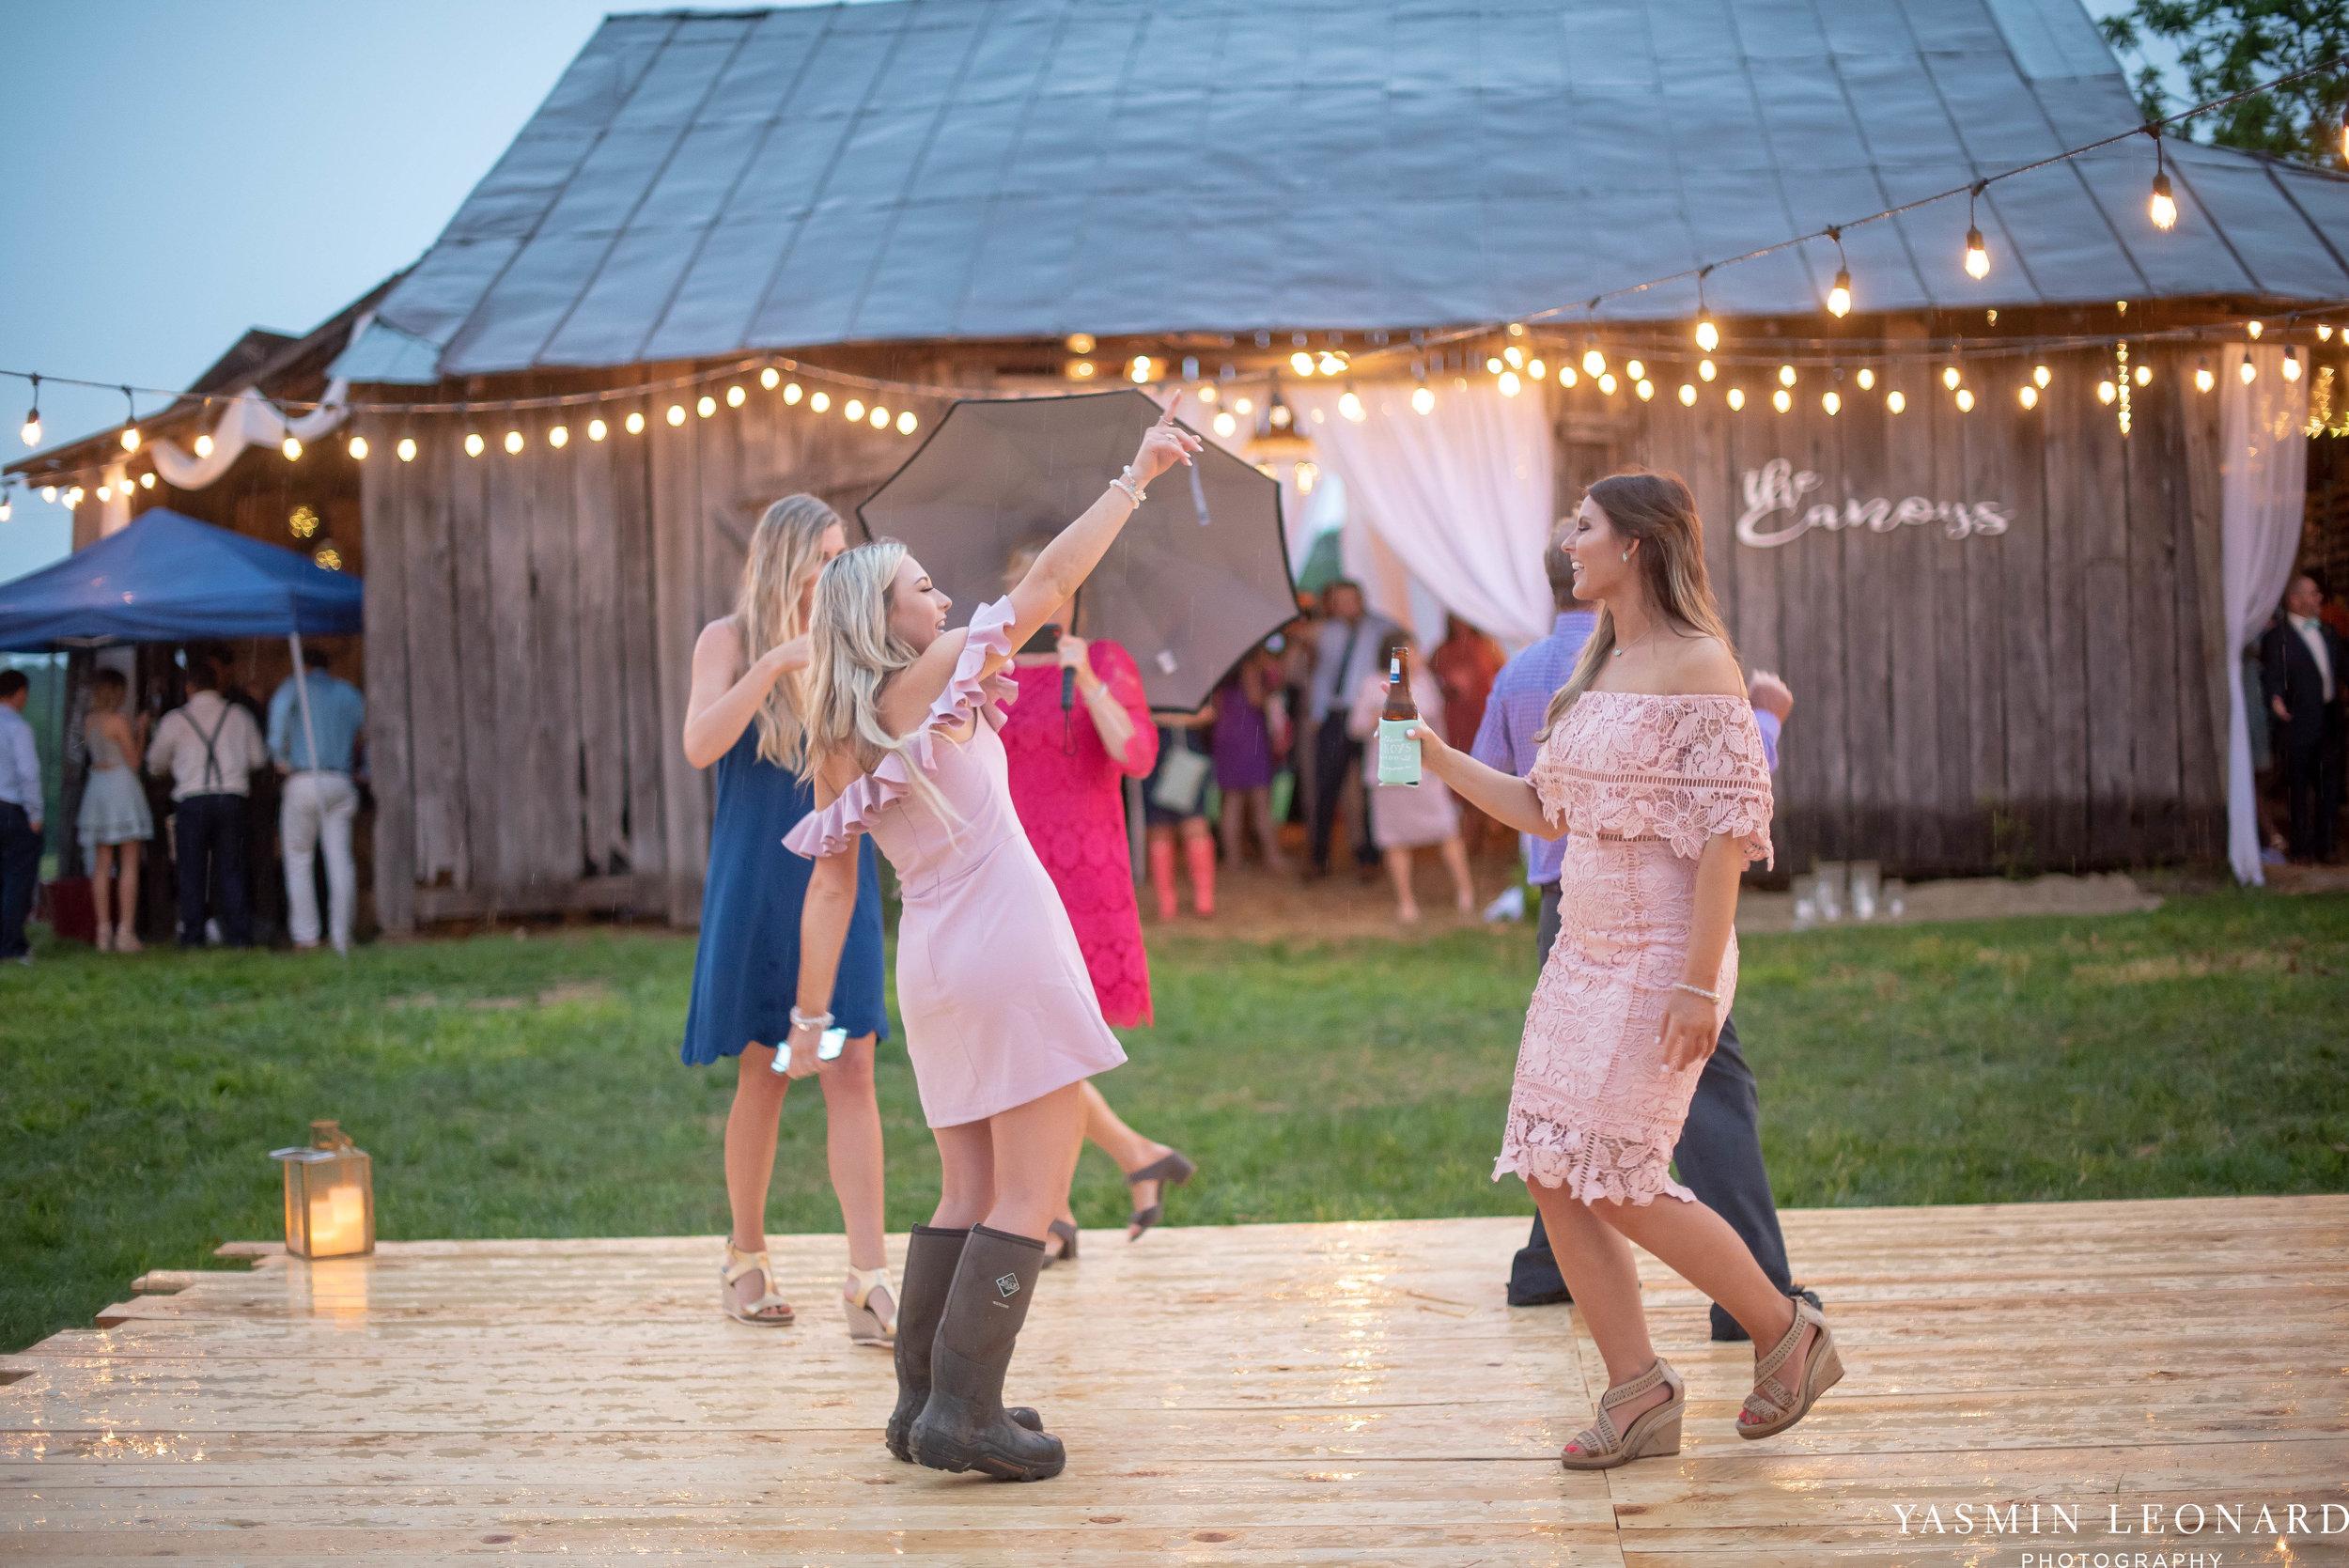 Rain on your wedding day - Rainy Wedding - Plan B for Rain - What to do if it rains on your wedding day - Wedding Inspiration - Outdoor wedding ideas - Rainy Wedding Pictures - Yasmin Leonard Photography-77.jpg